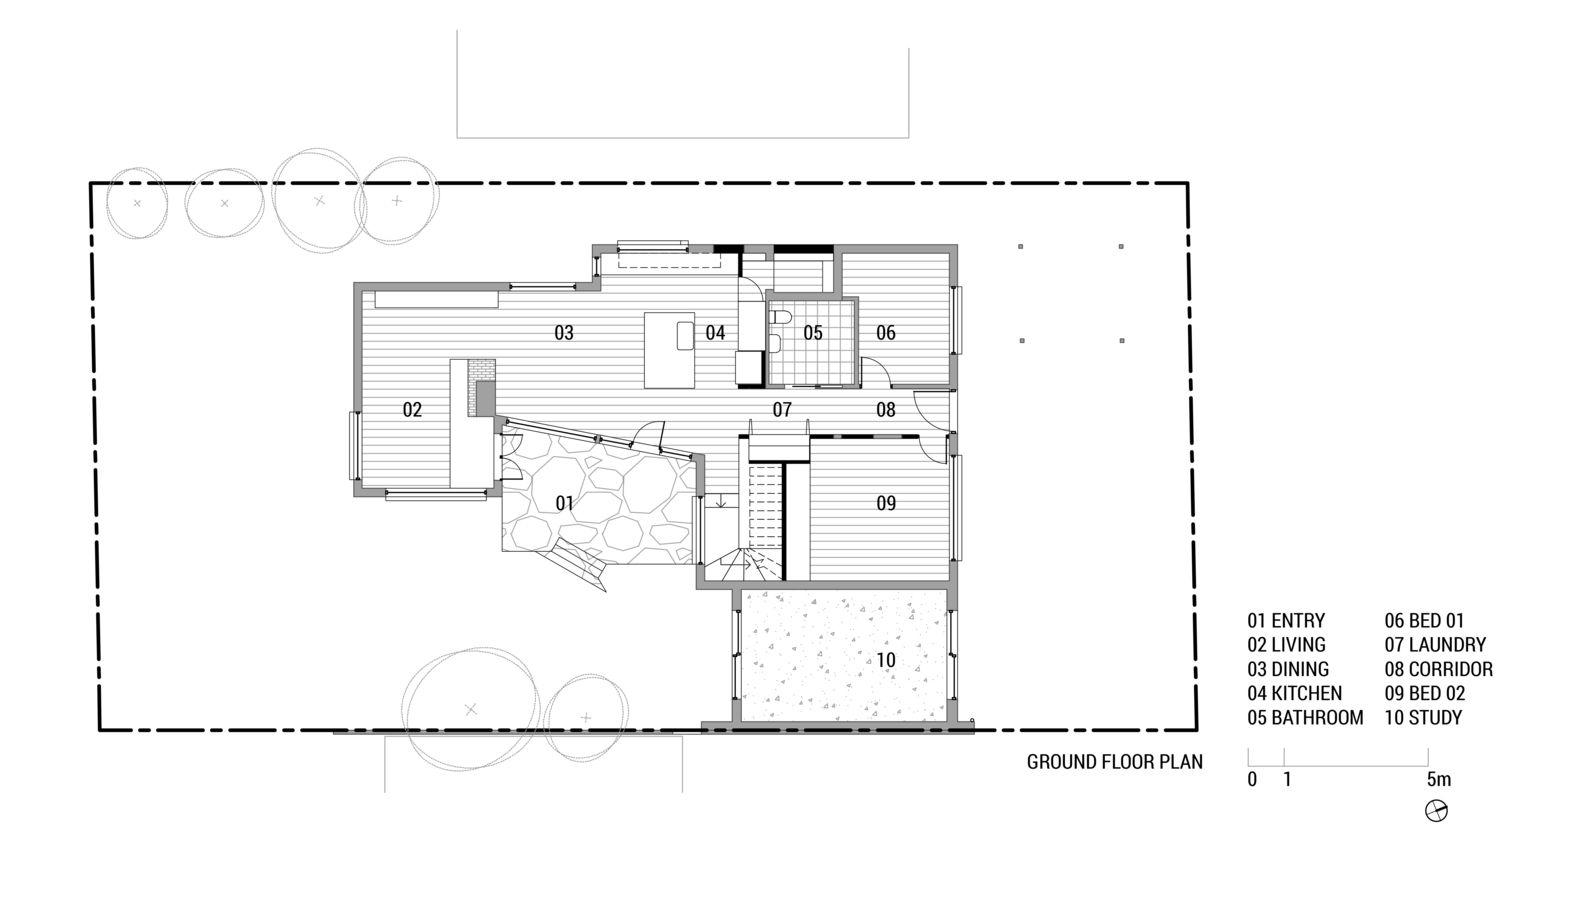 Gallery Of Ruby Foomann Architects 14 Floor Plans Ground Floor Plan Architect